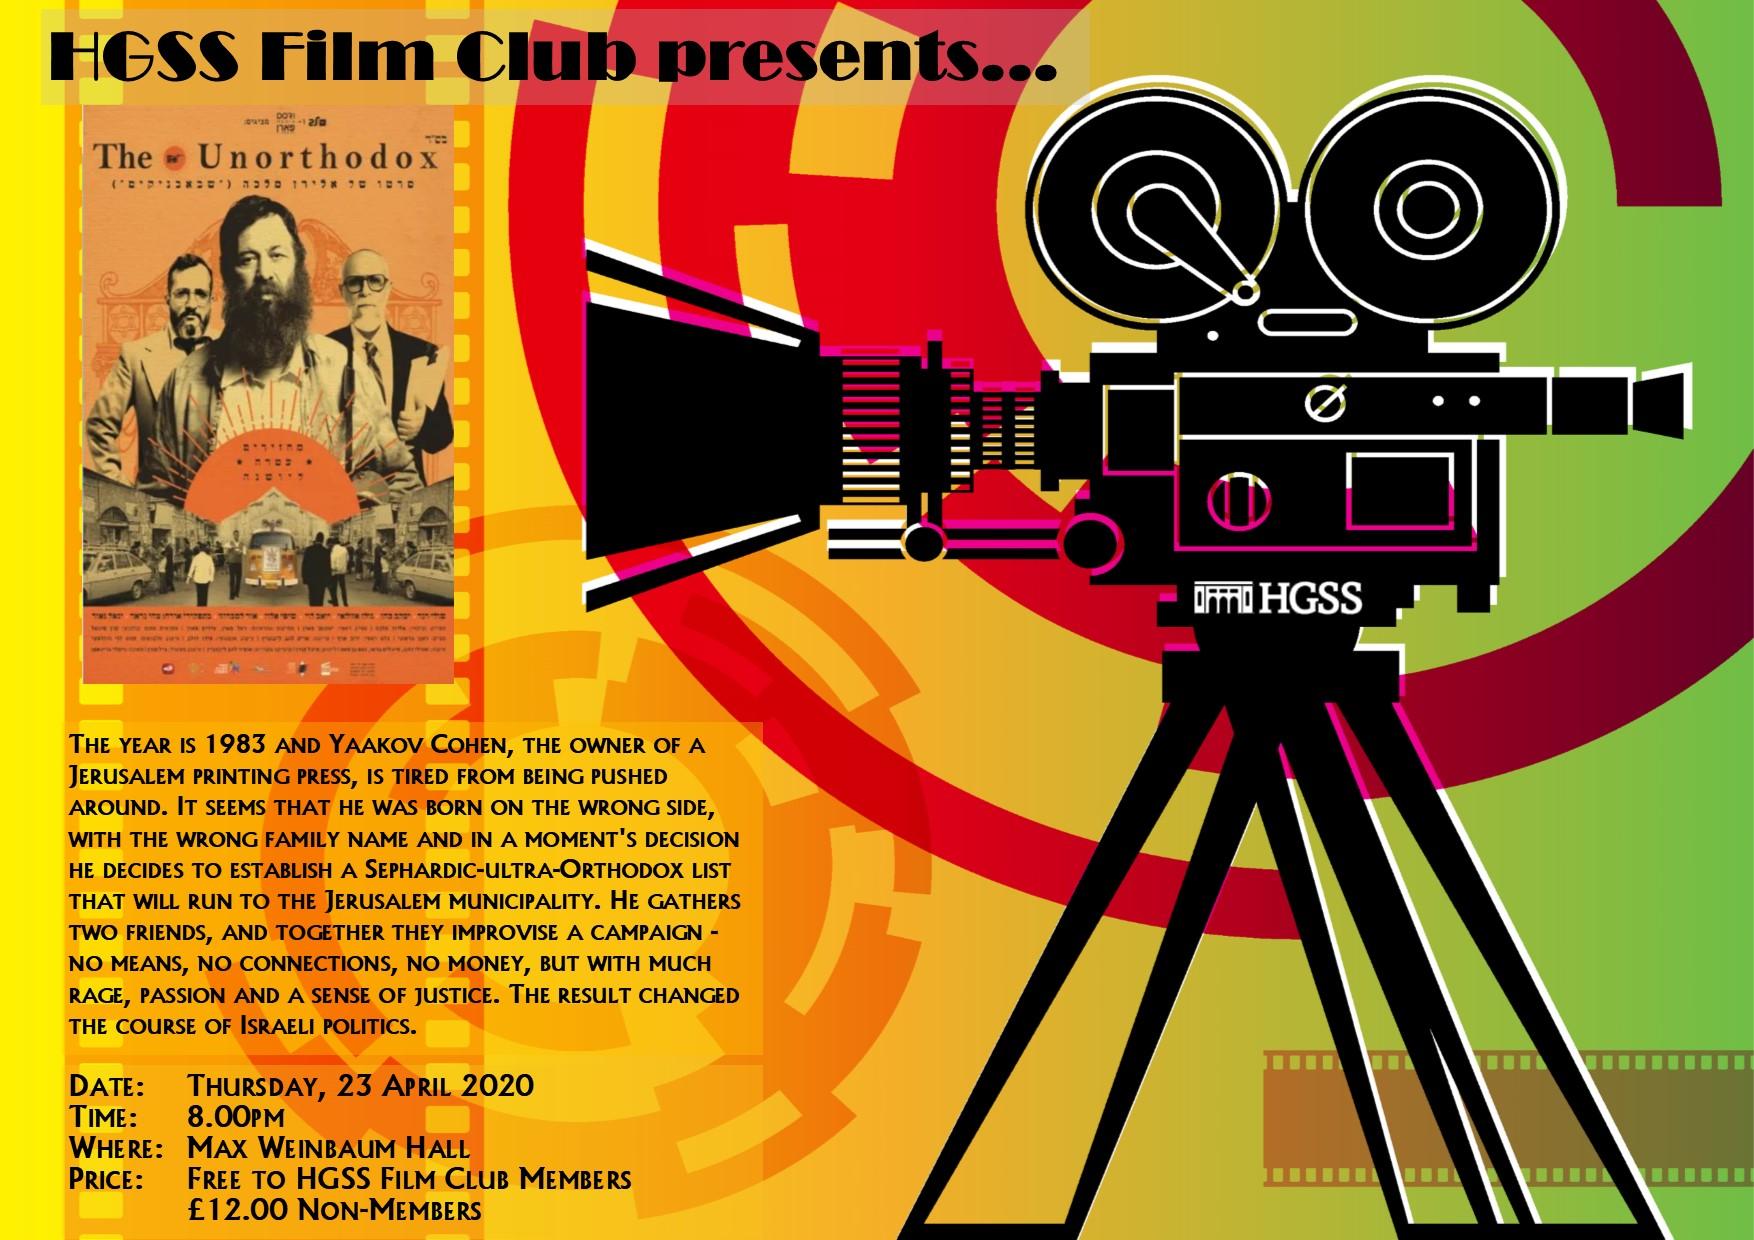 HGSS Film Club - Postponed @ Max Weinbaum Hall